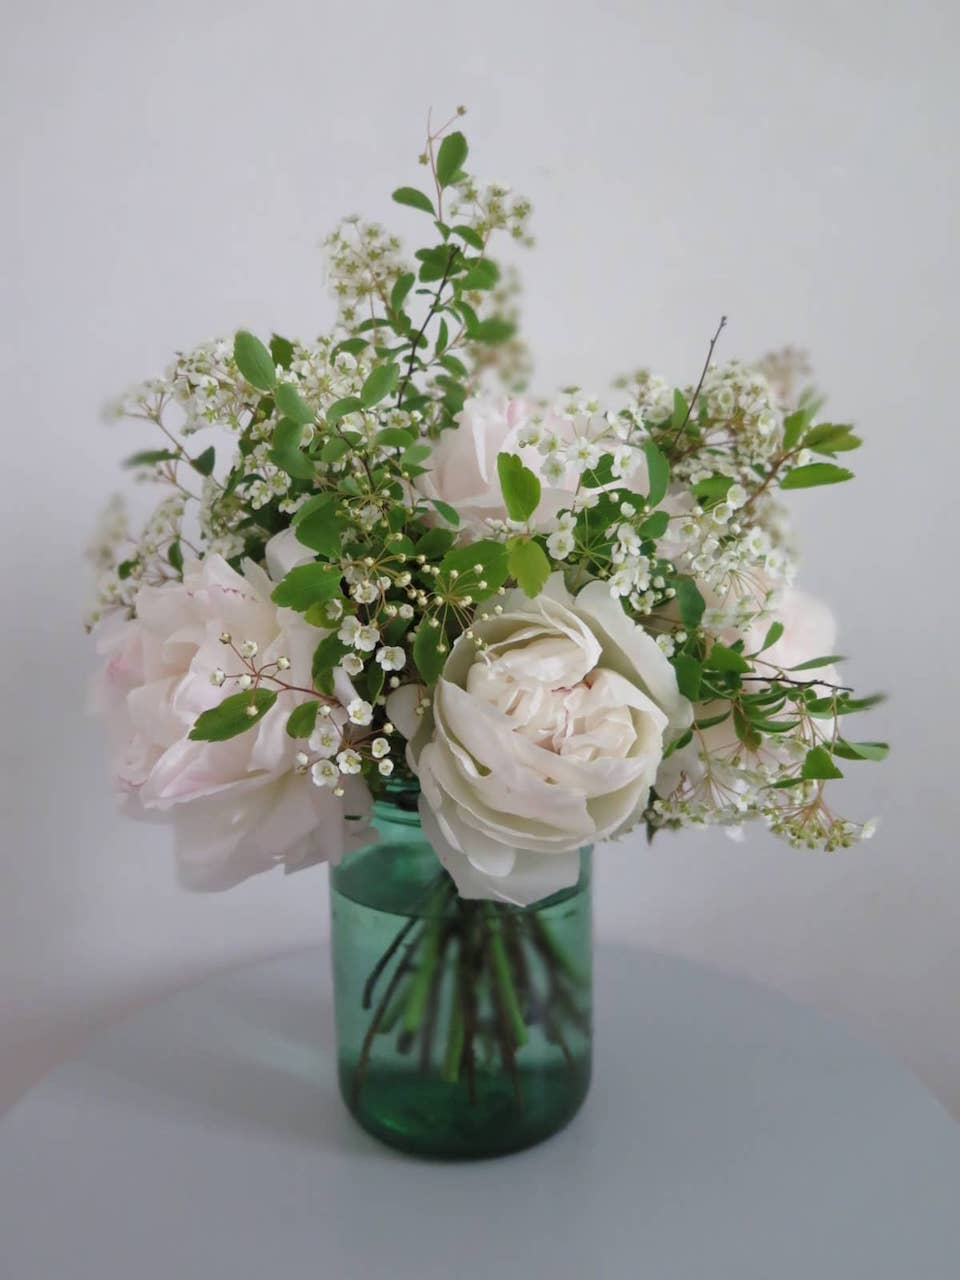 lieu-reception-champetre-printemps-pastel-mariage